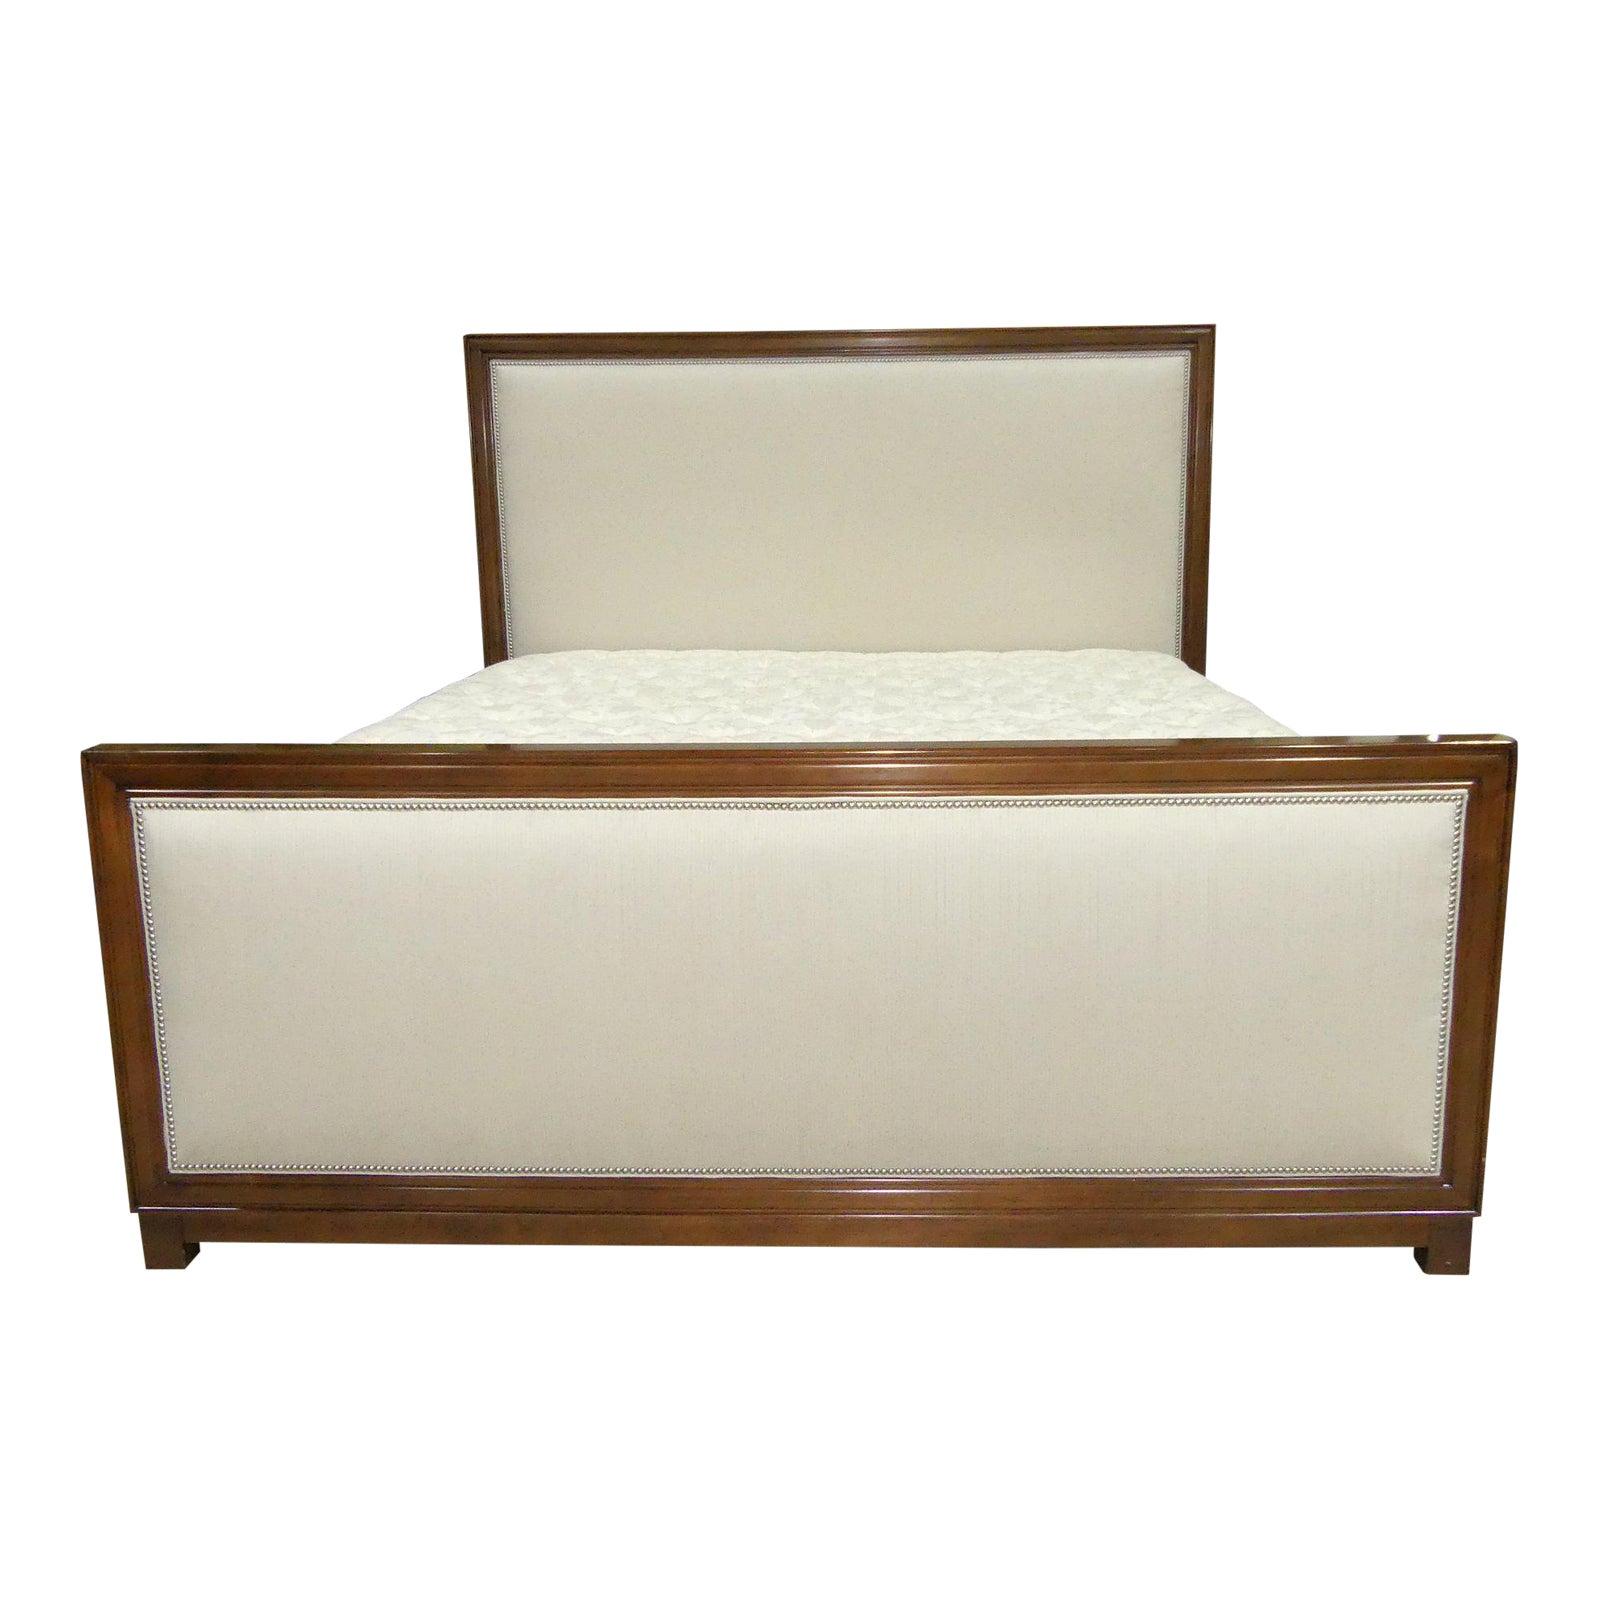 Swaim Upholstered King Size Bed